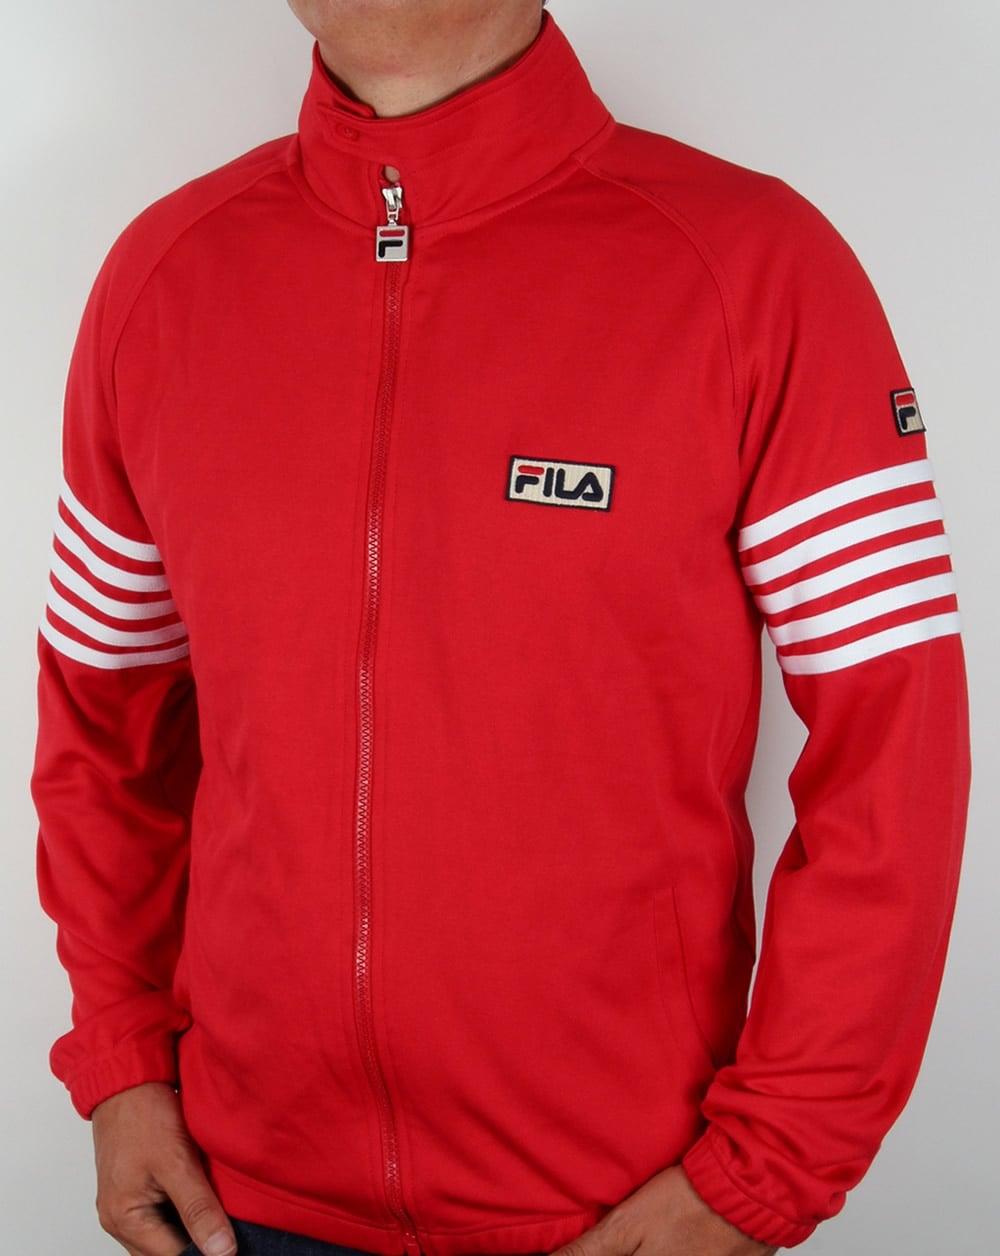 707983634cd Fila Vintage 5 Stripe Track Top Red,tracksuit,jacket | 80s Casuals